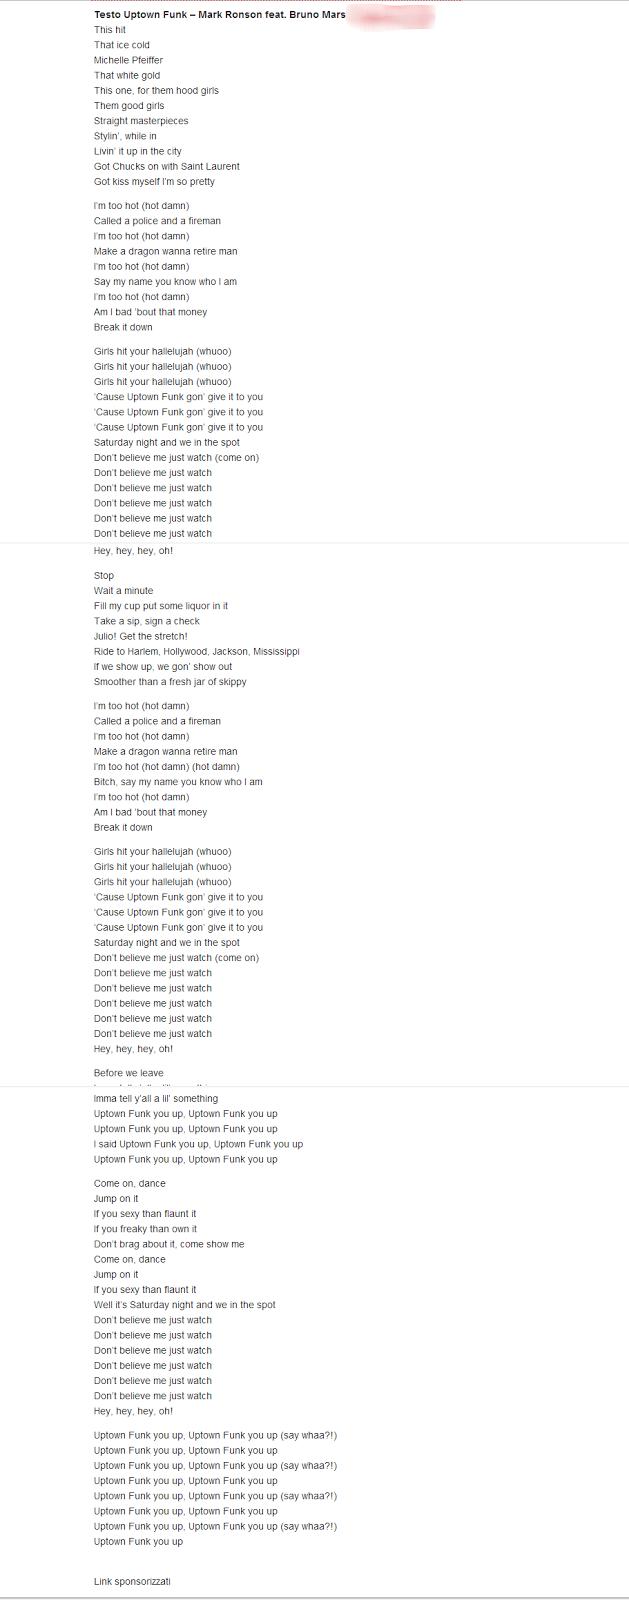 testo traduzione Uptown Funk